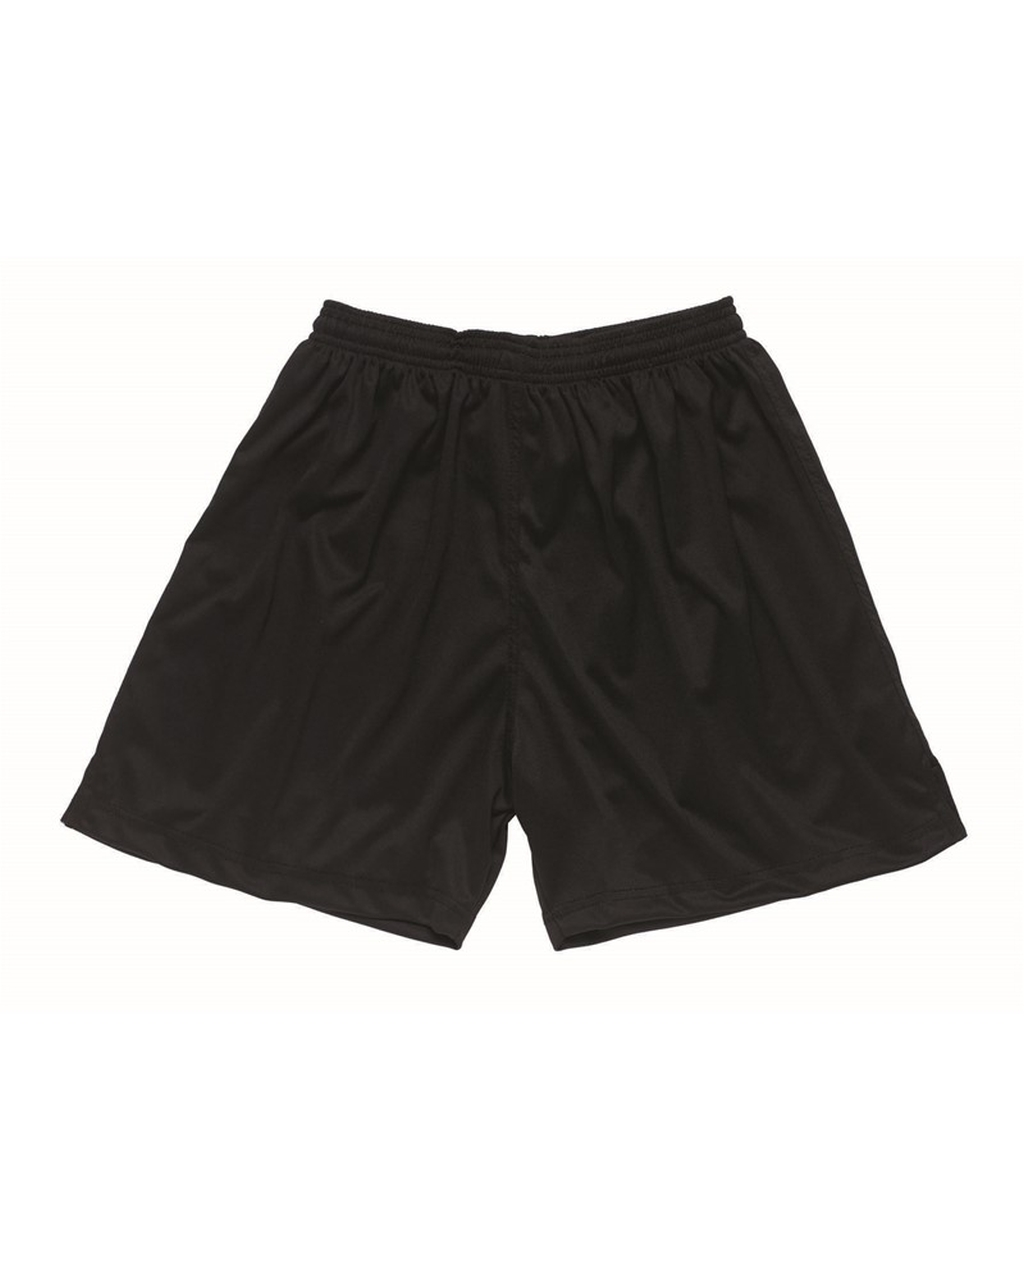 Sports Shorts - 26/28